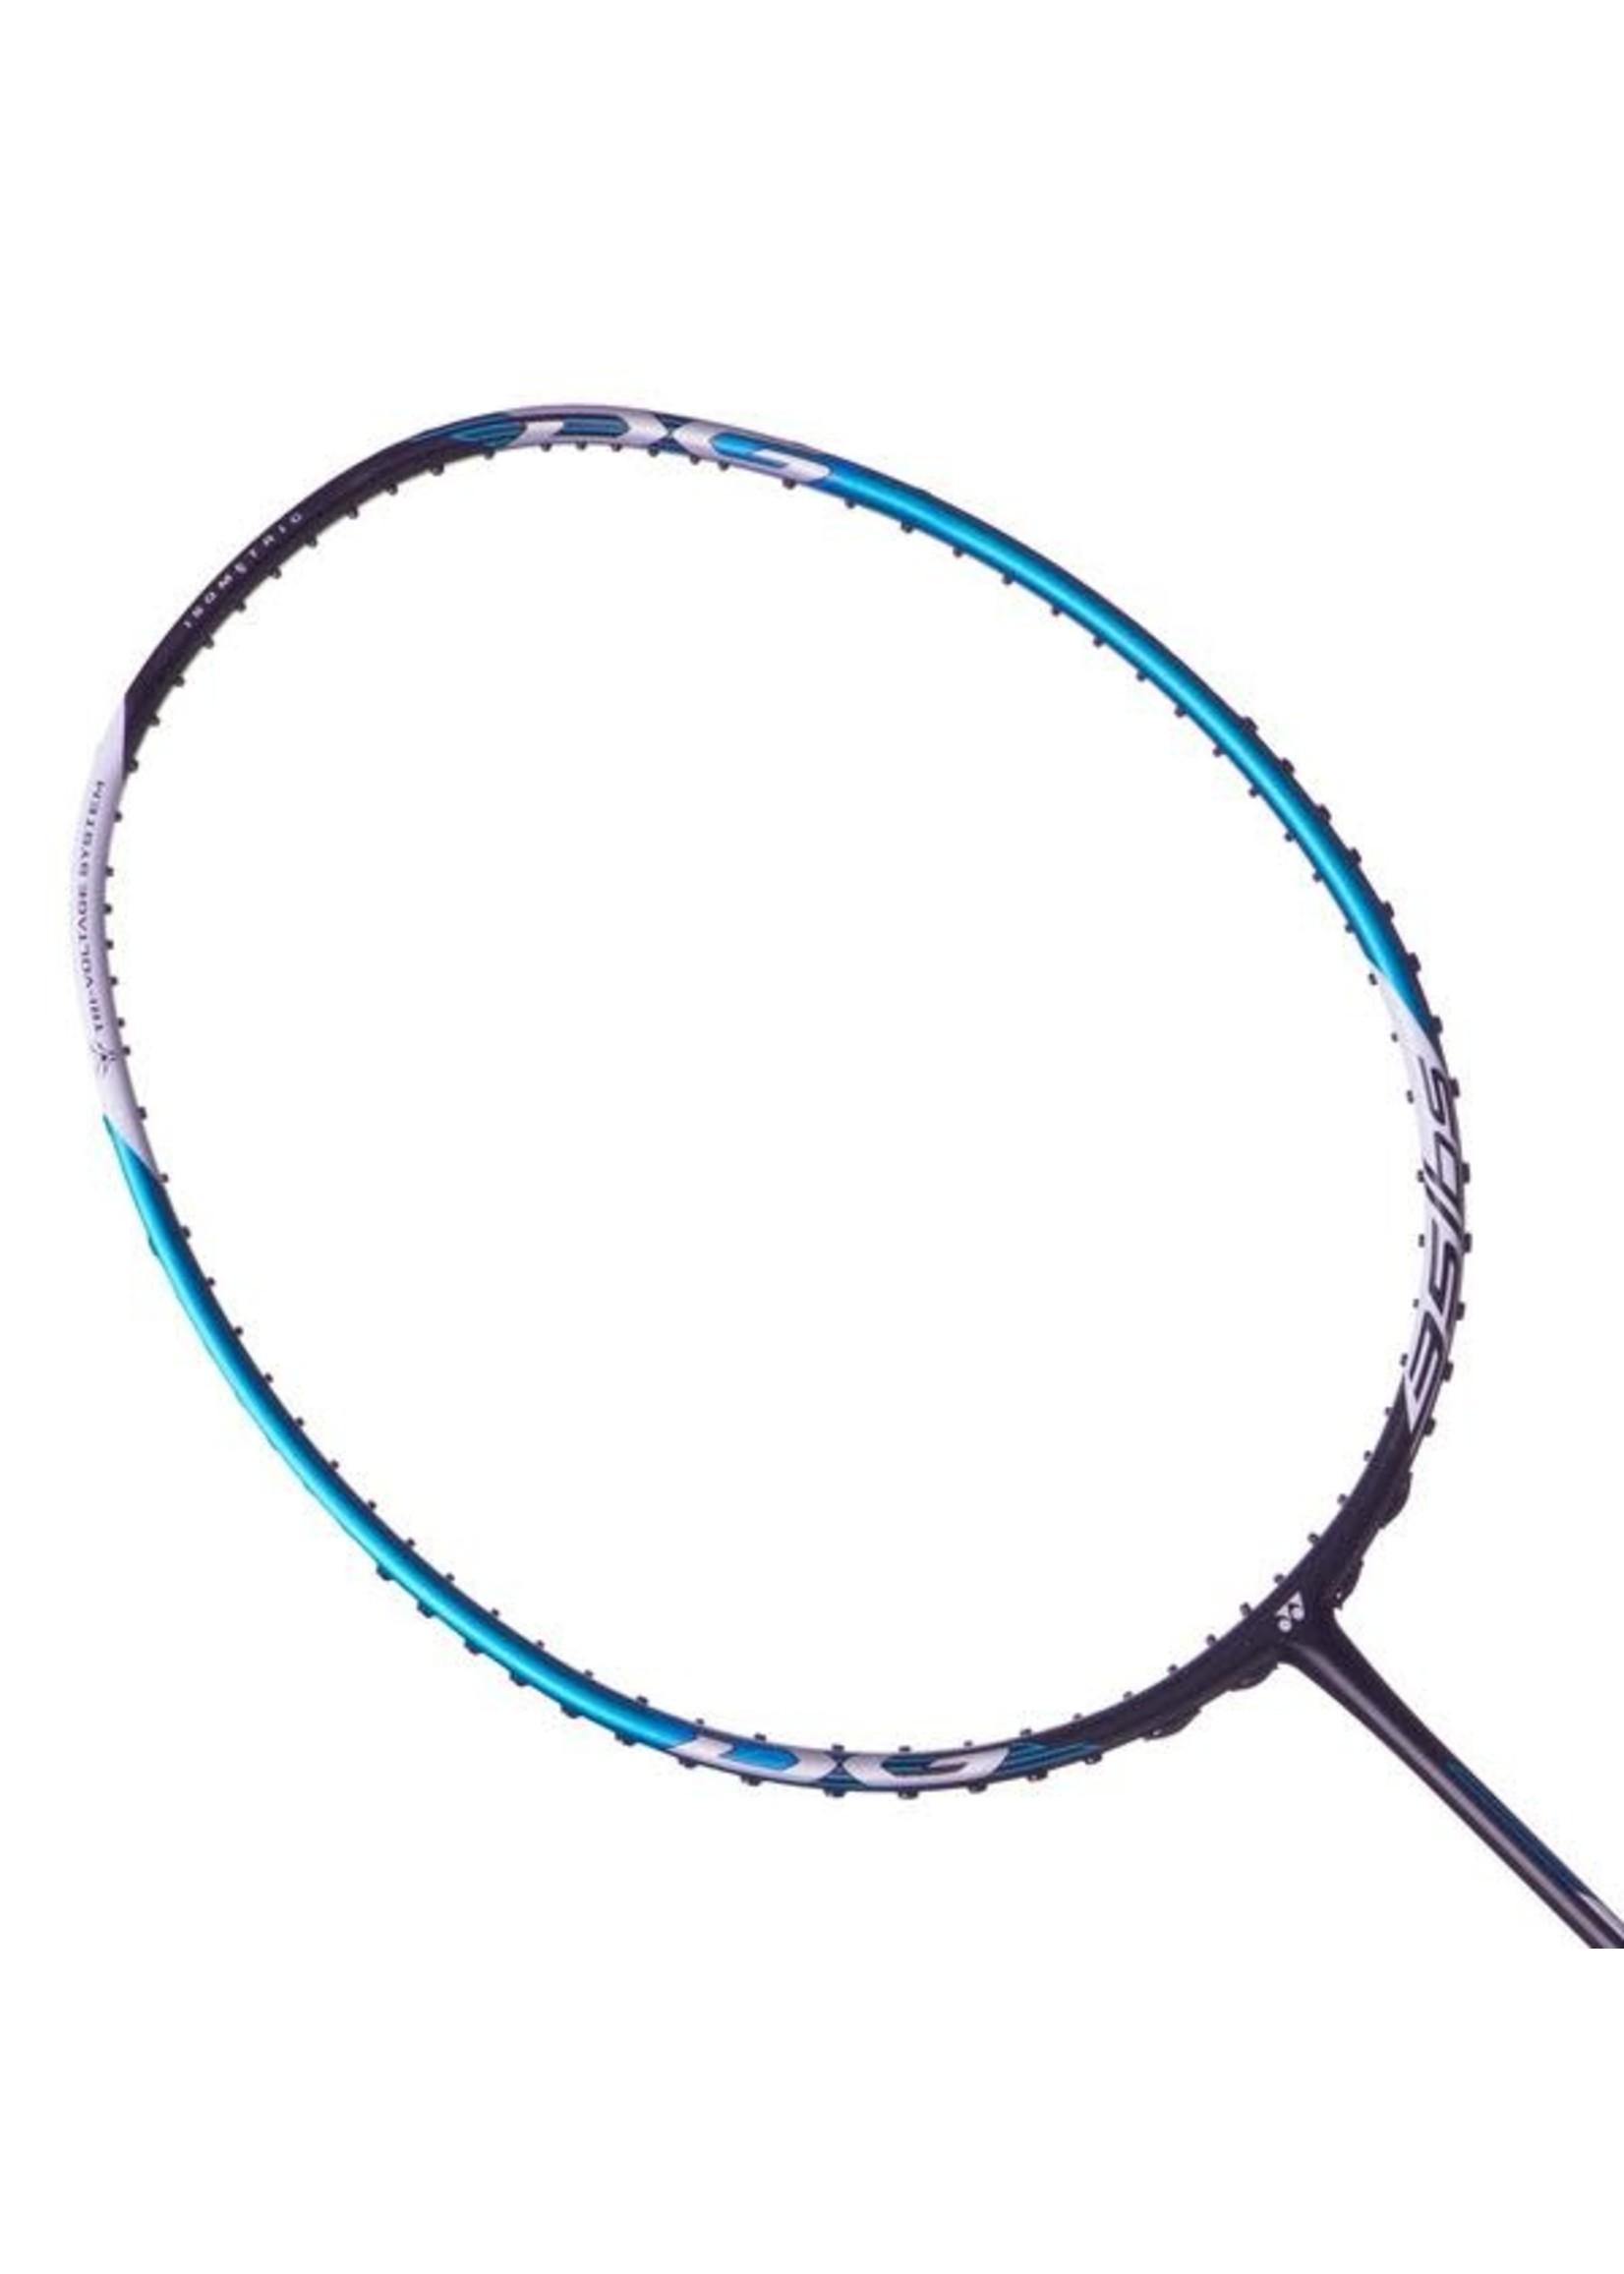 Yonex Yonex Voltric 8 DG Slim Badminton Racket (2019)